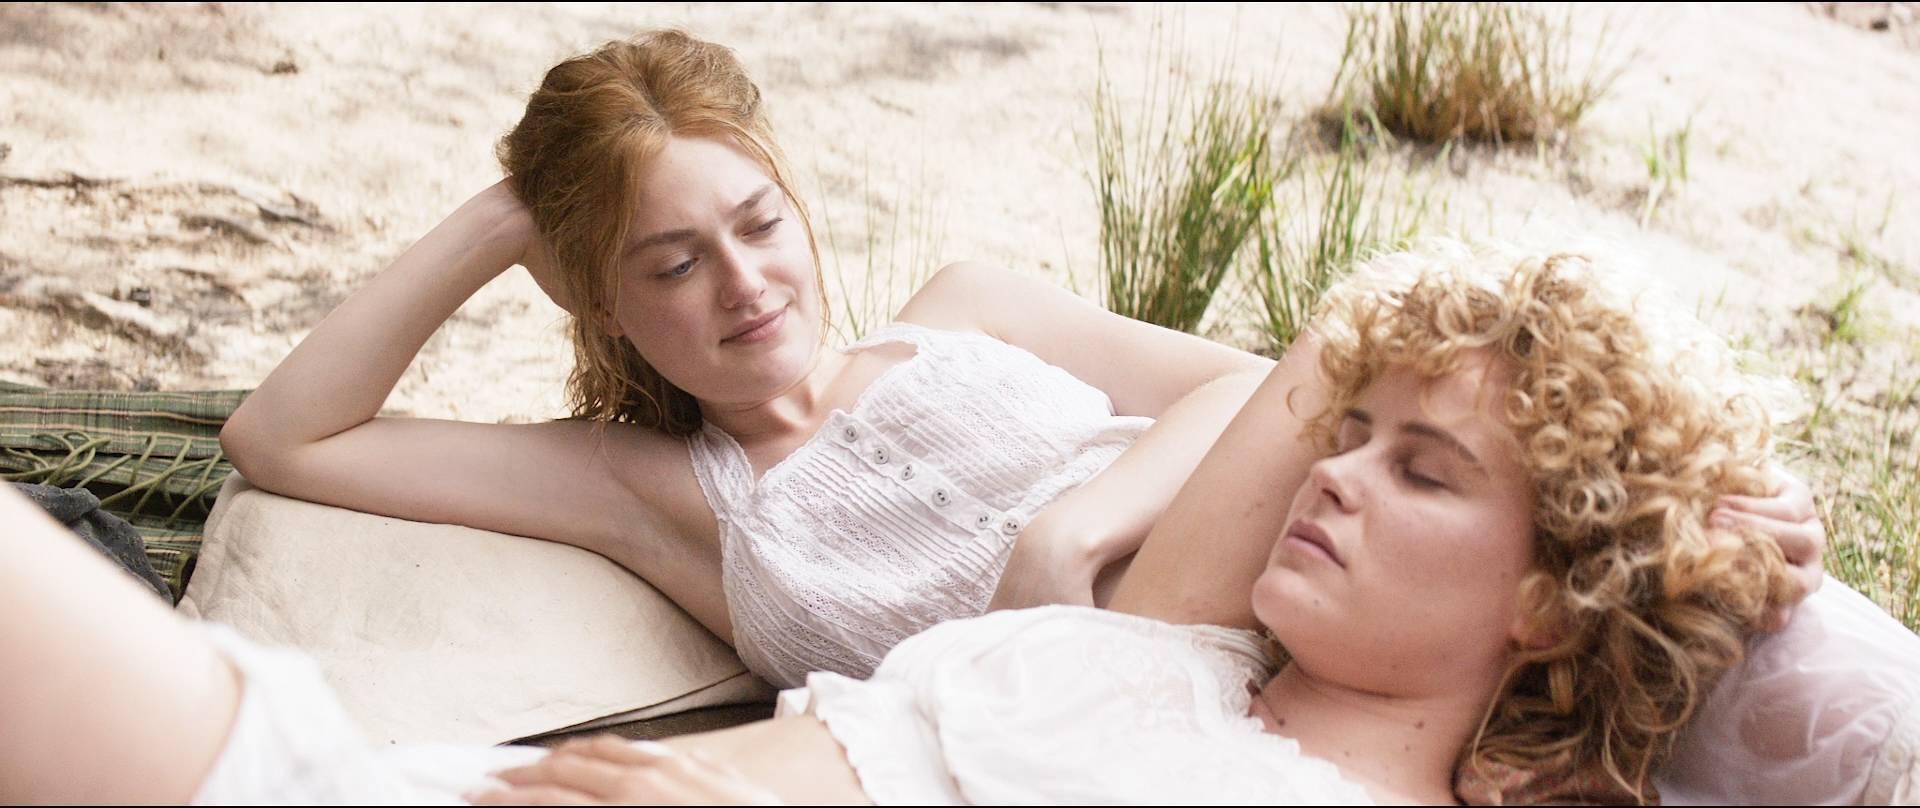 Dakota Fanning hot, Carla Juri, Vera Vitali others nude bush - Brimstone (2016) HD 1080p BluRay (17)